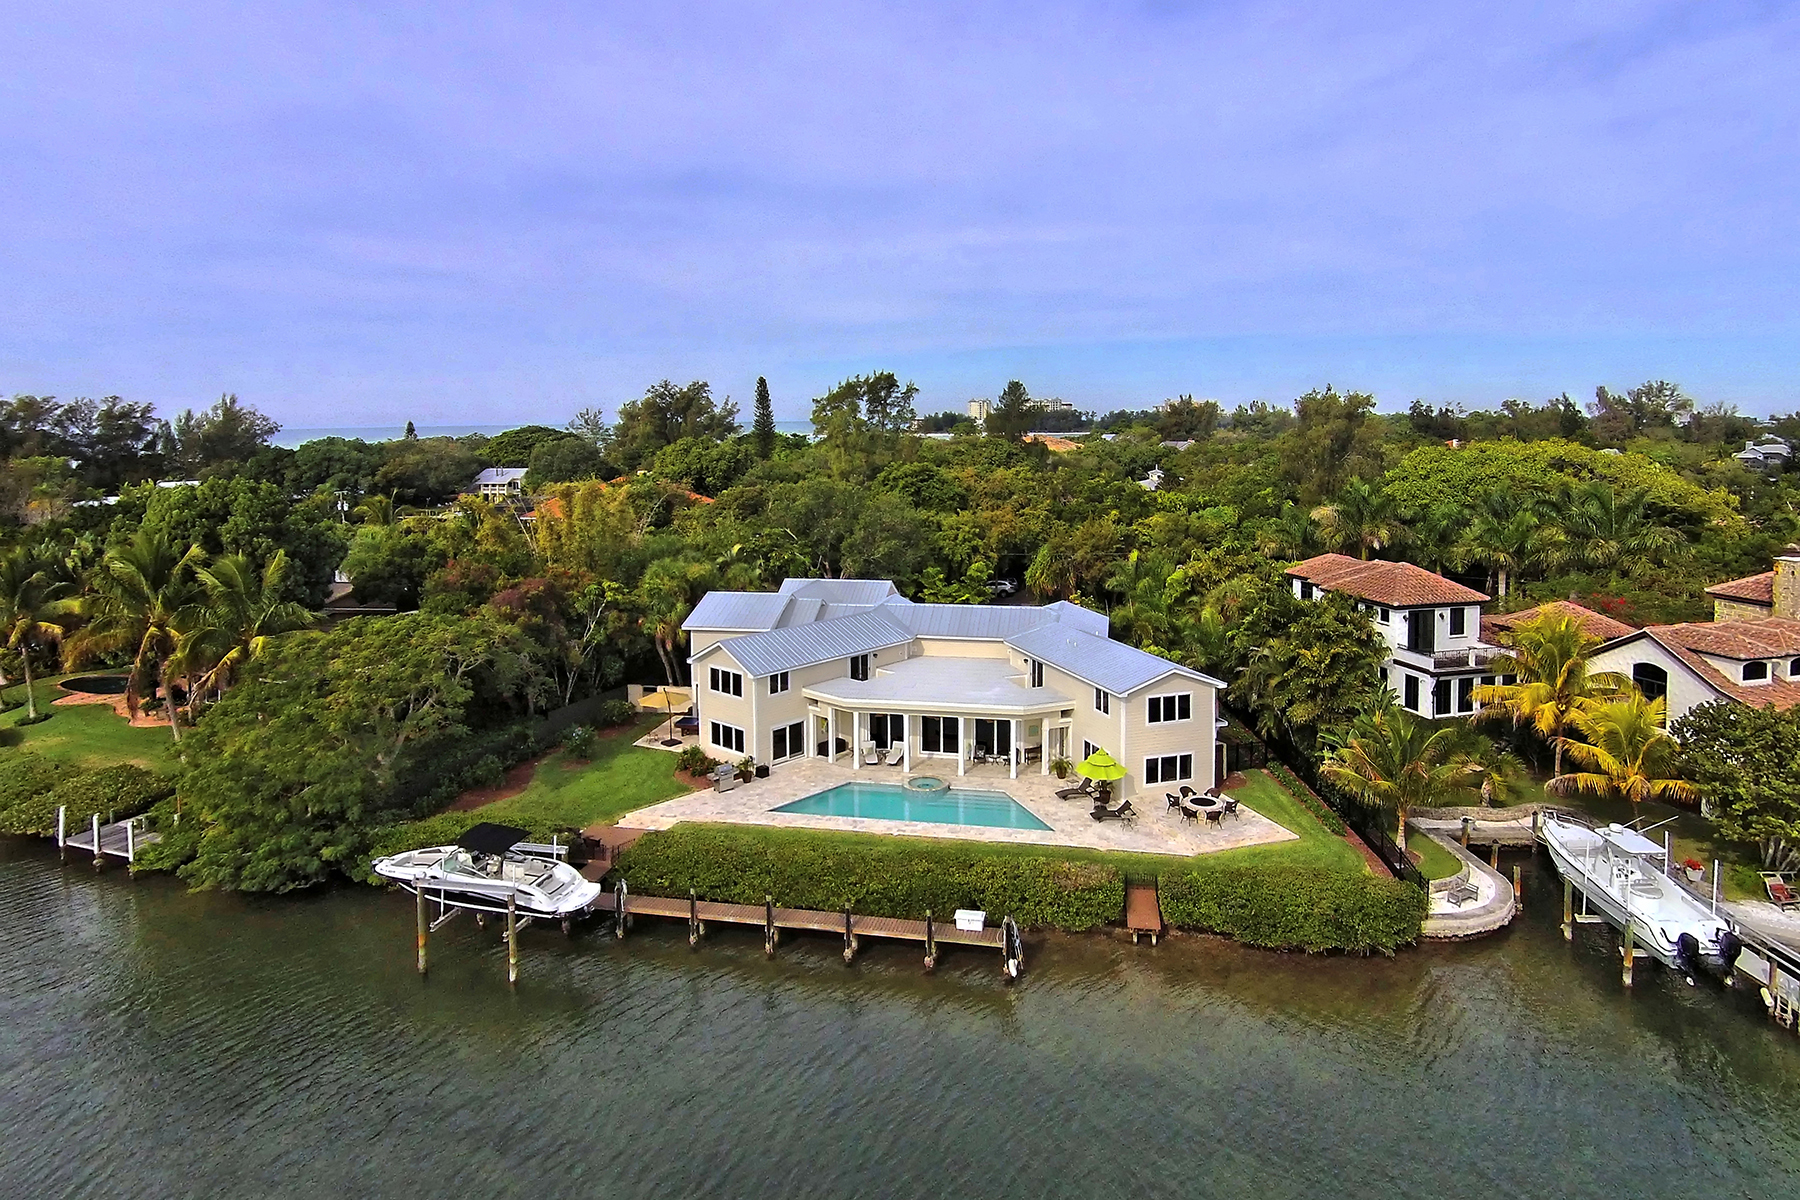 Single Family Home for Sale at CEDAR PARK 271 Cedar Park Cir, Sarasota, Florida 34242 United States